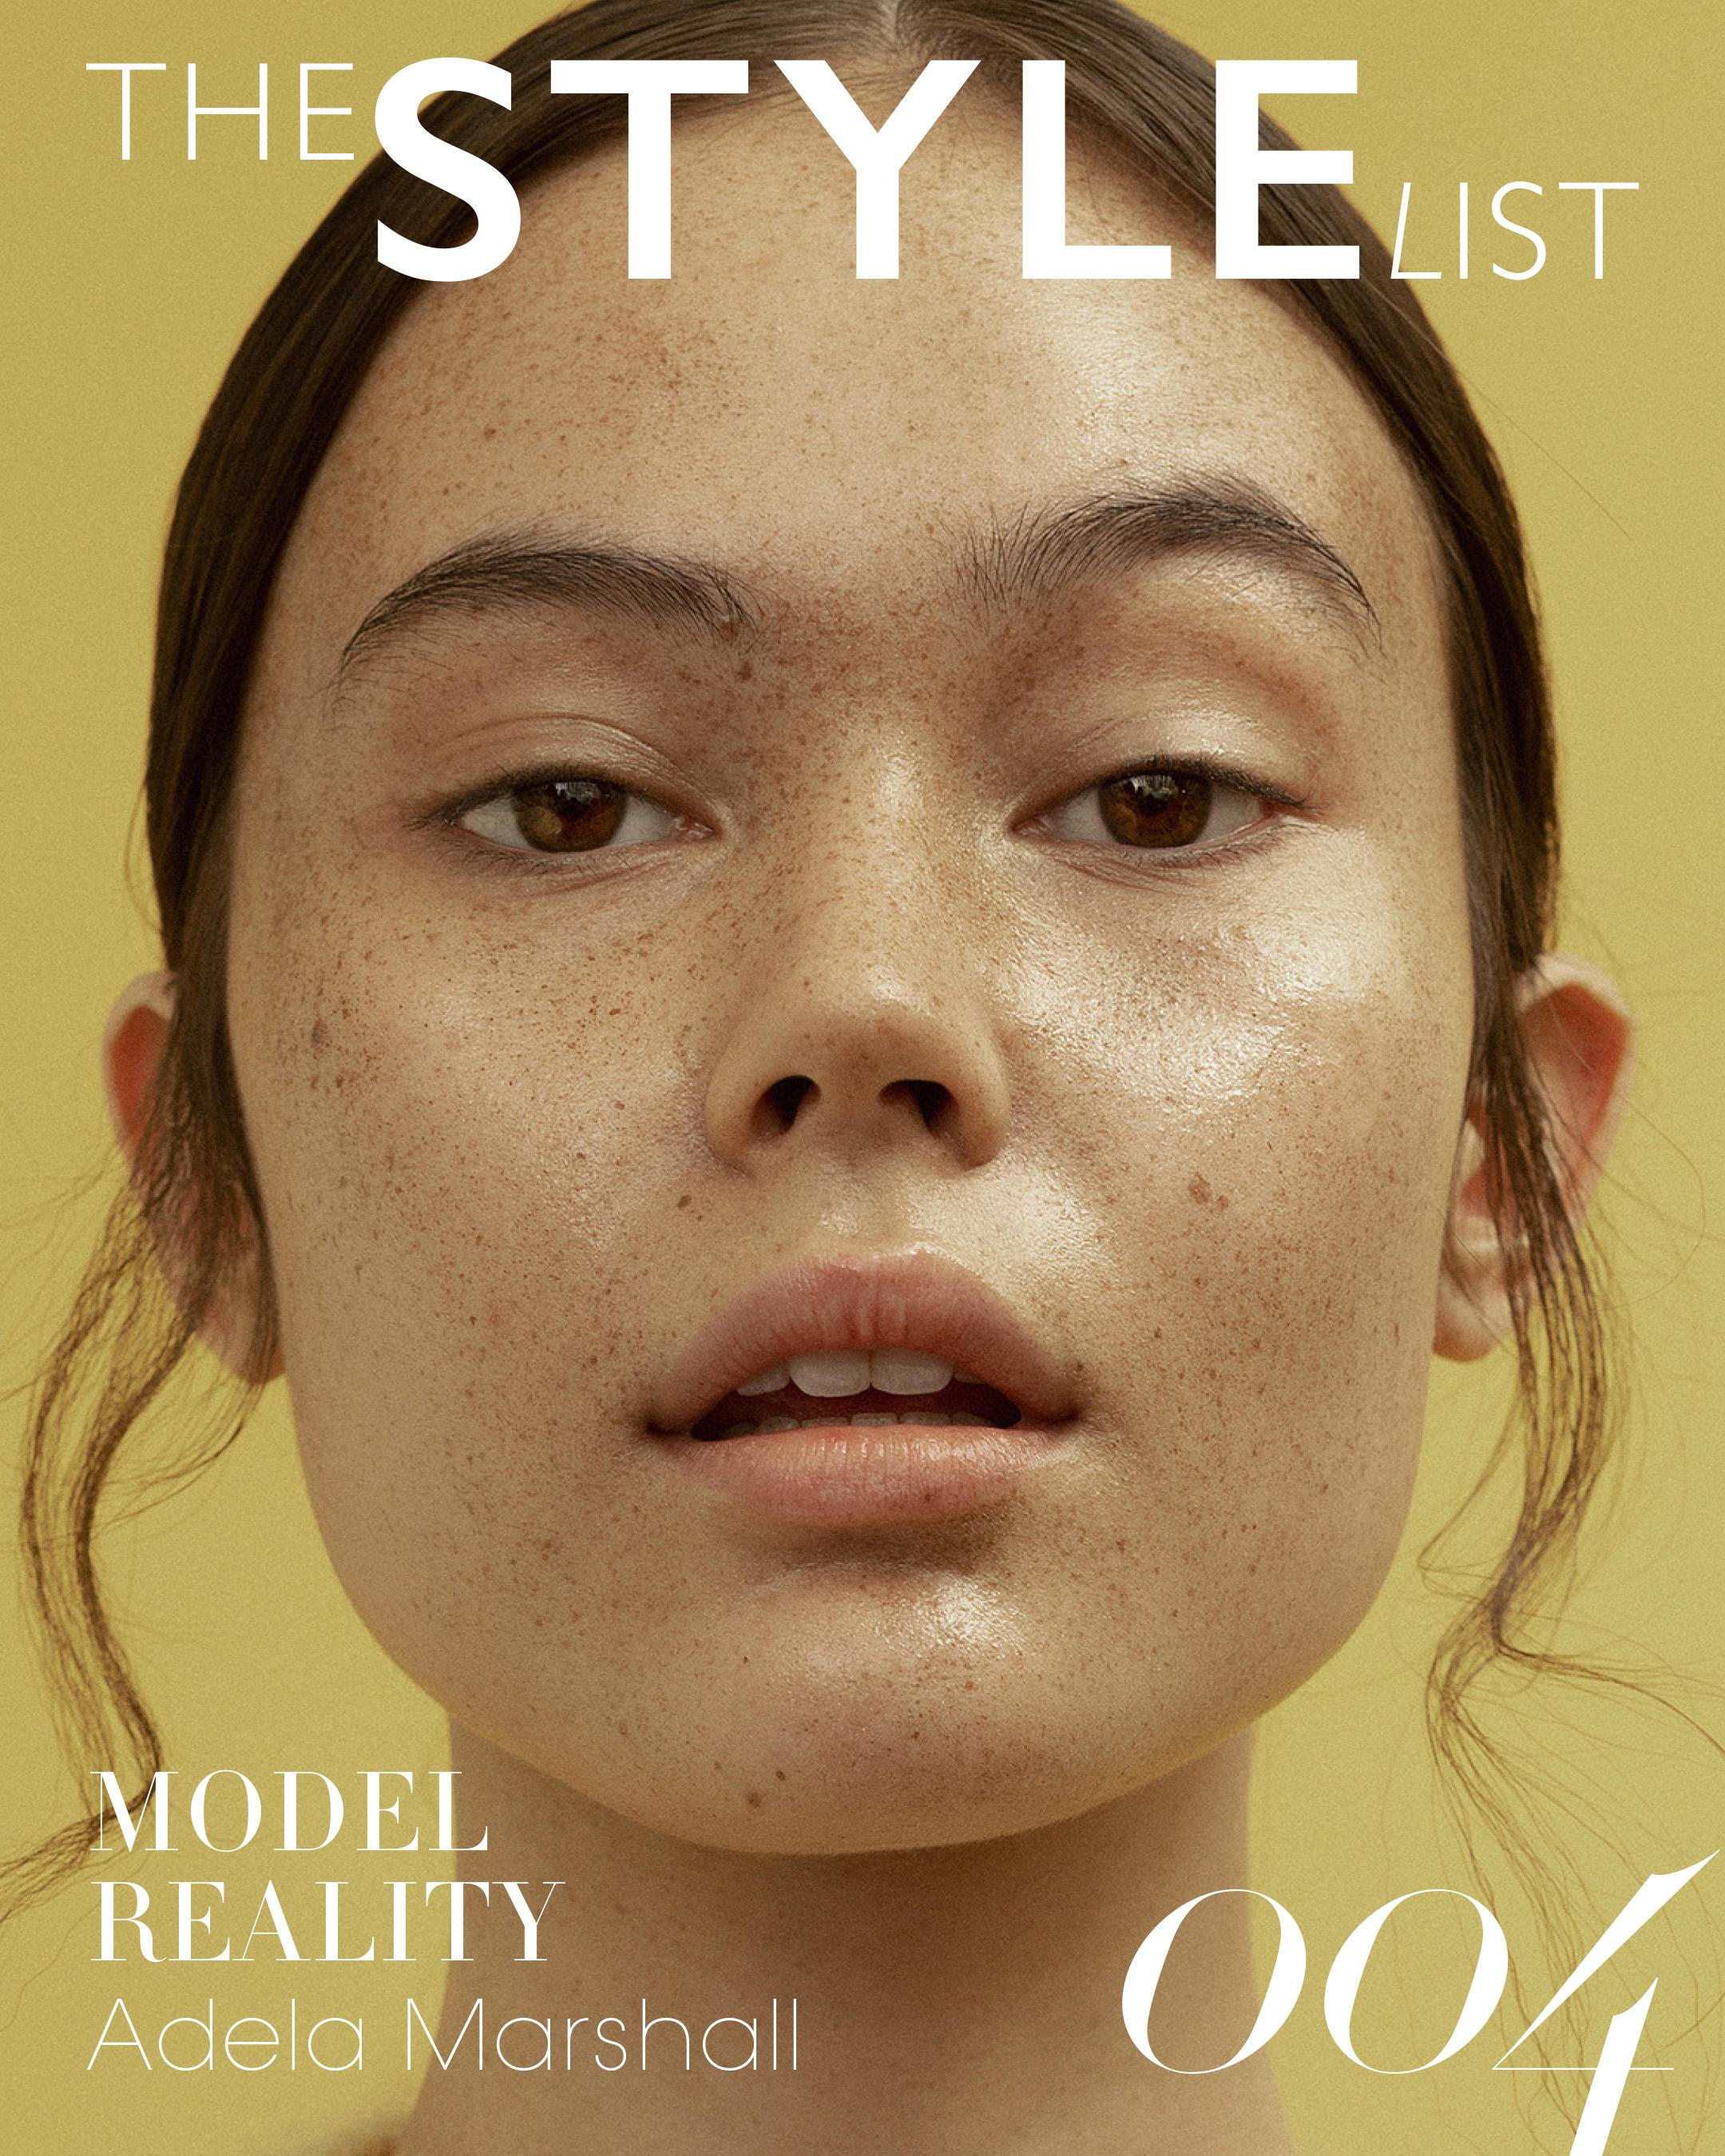 TheStyleListPh Cover-Adela4-1.jpg